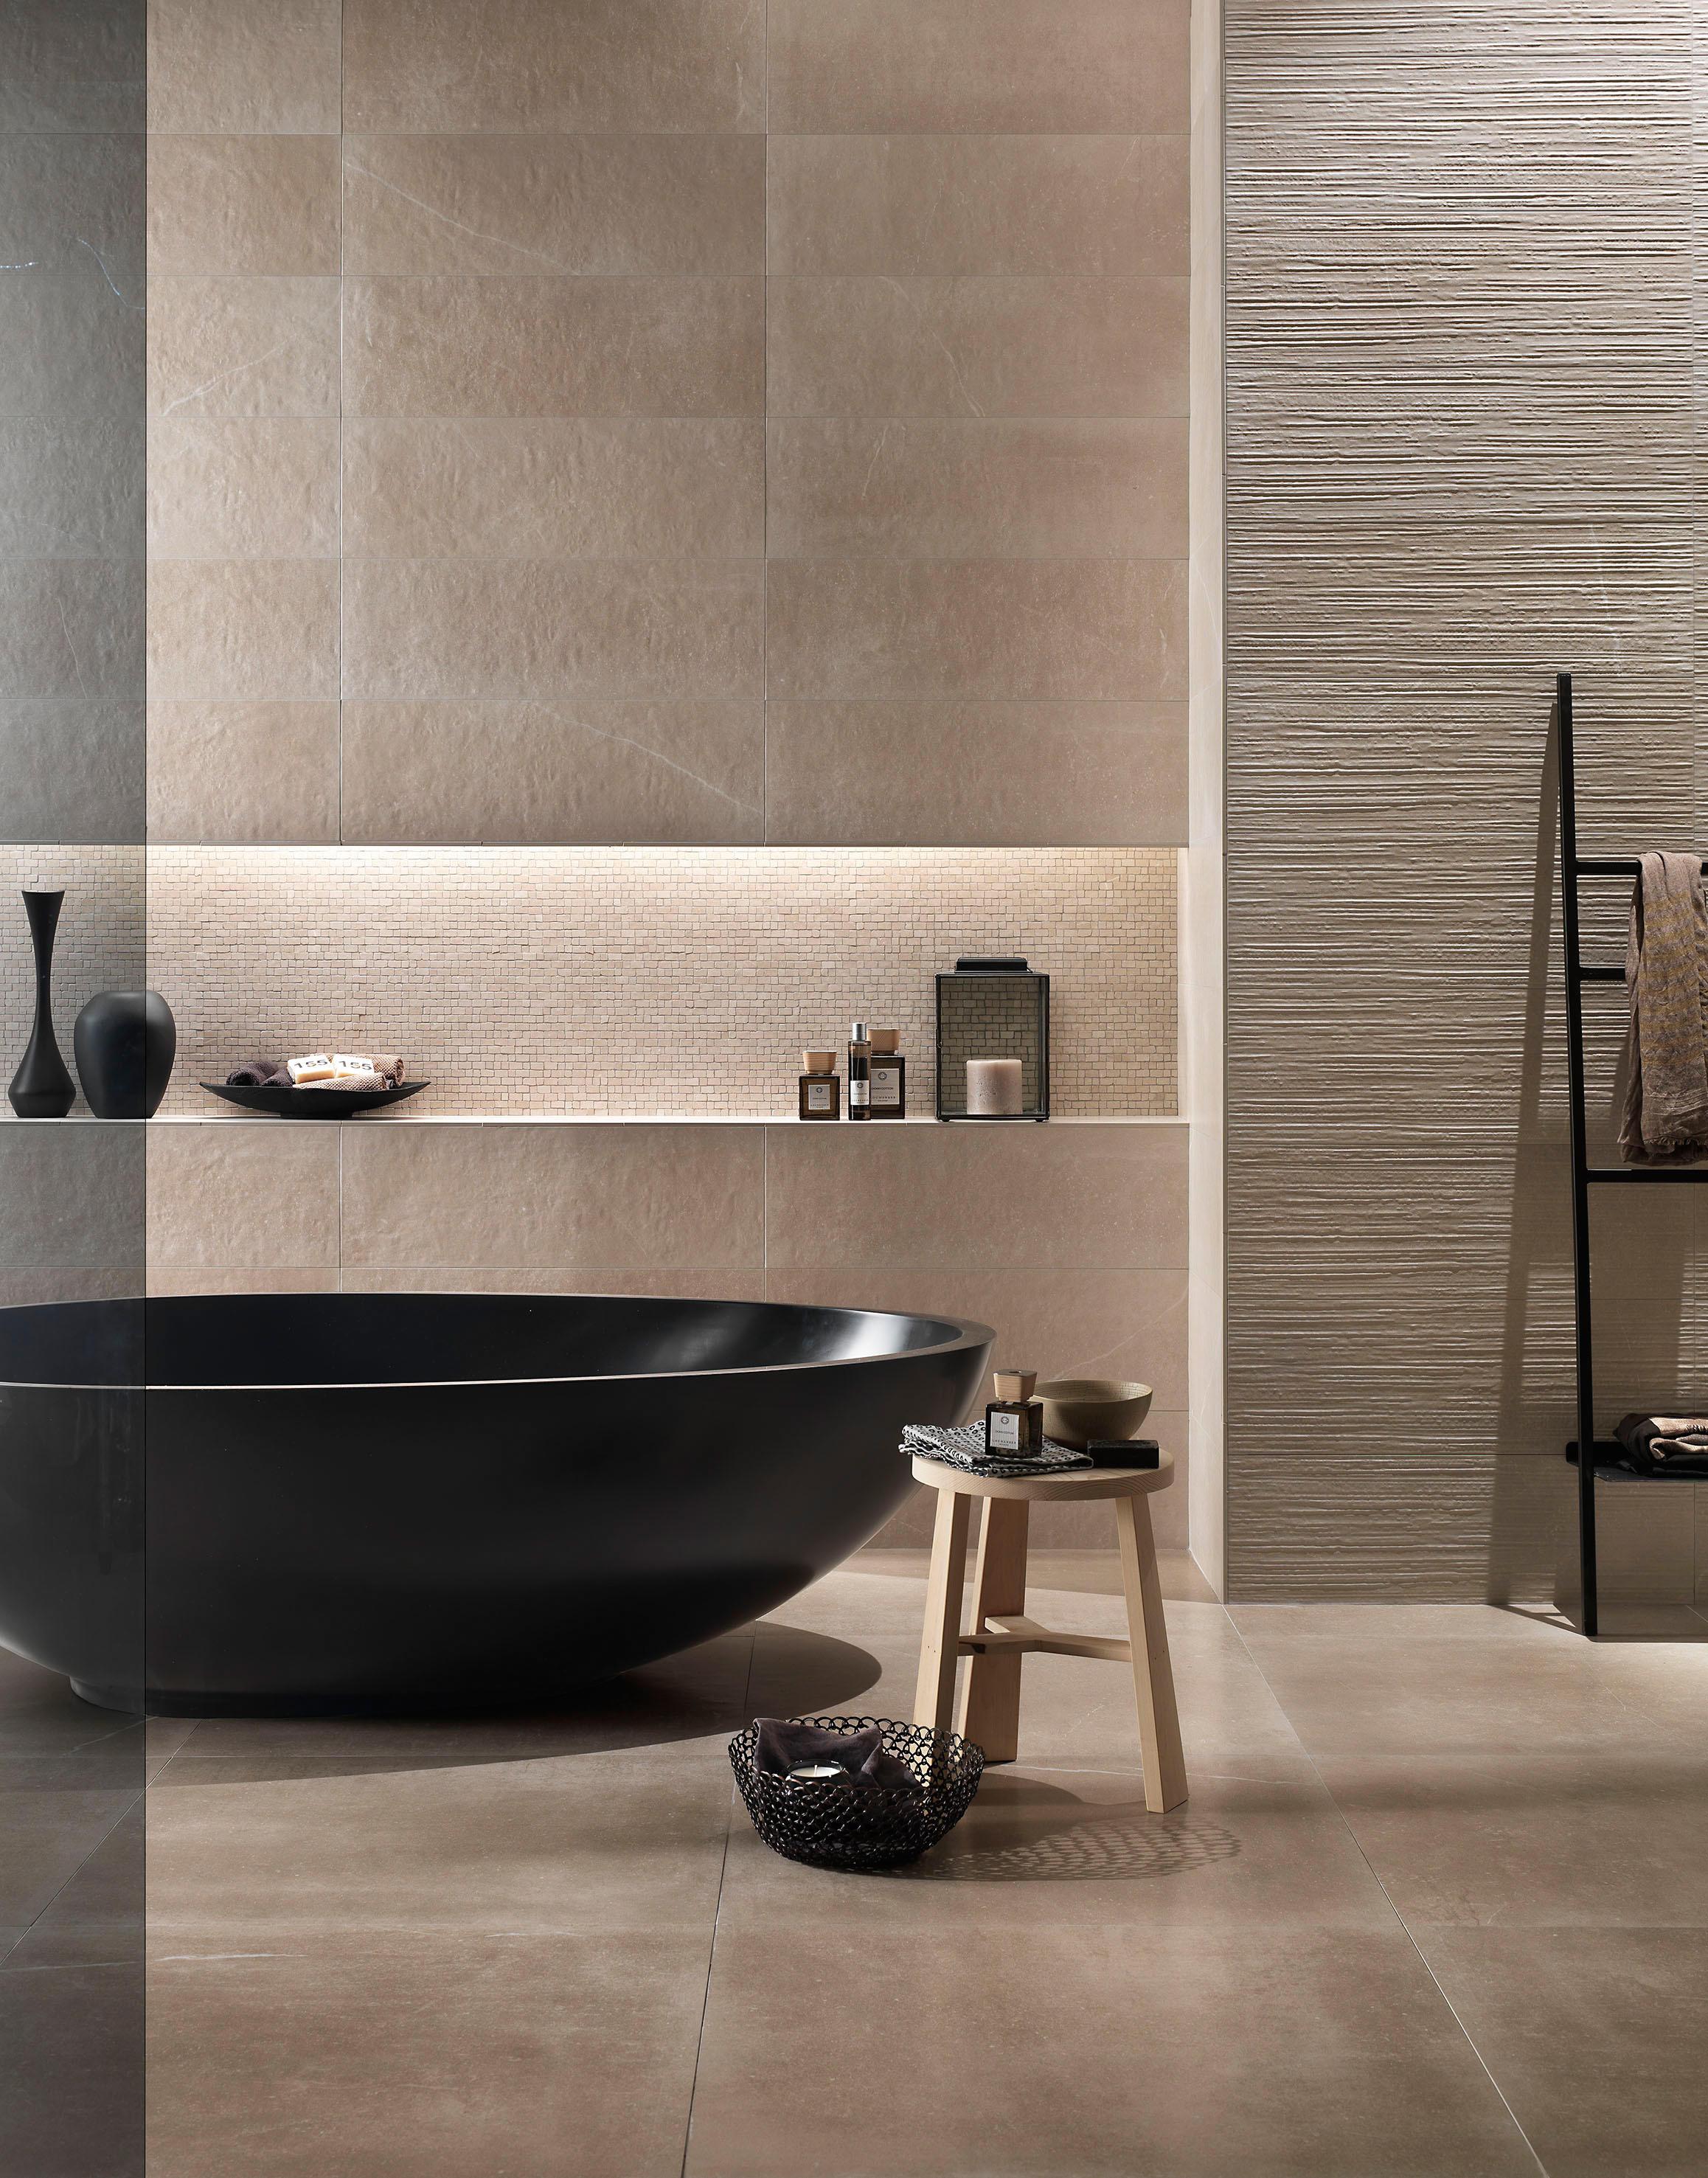 Maku Grey Matt Ceramic Tiles From Fap Ceramiche Architonic